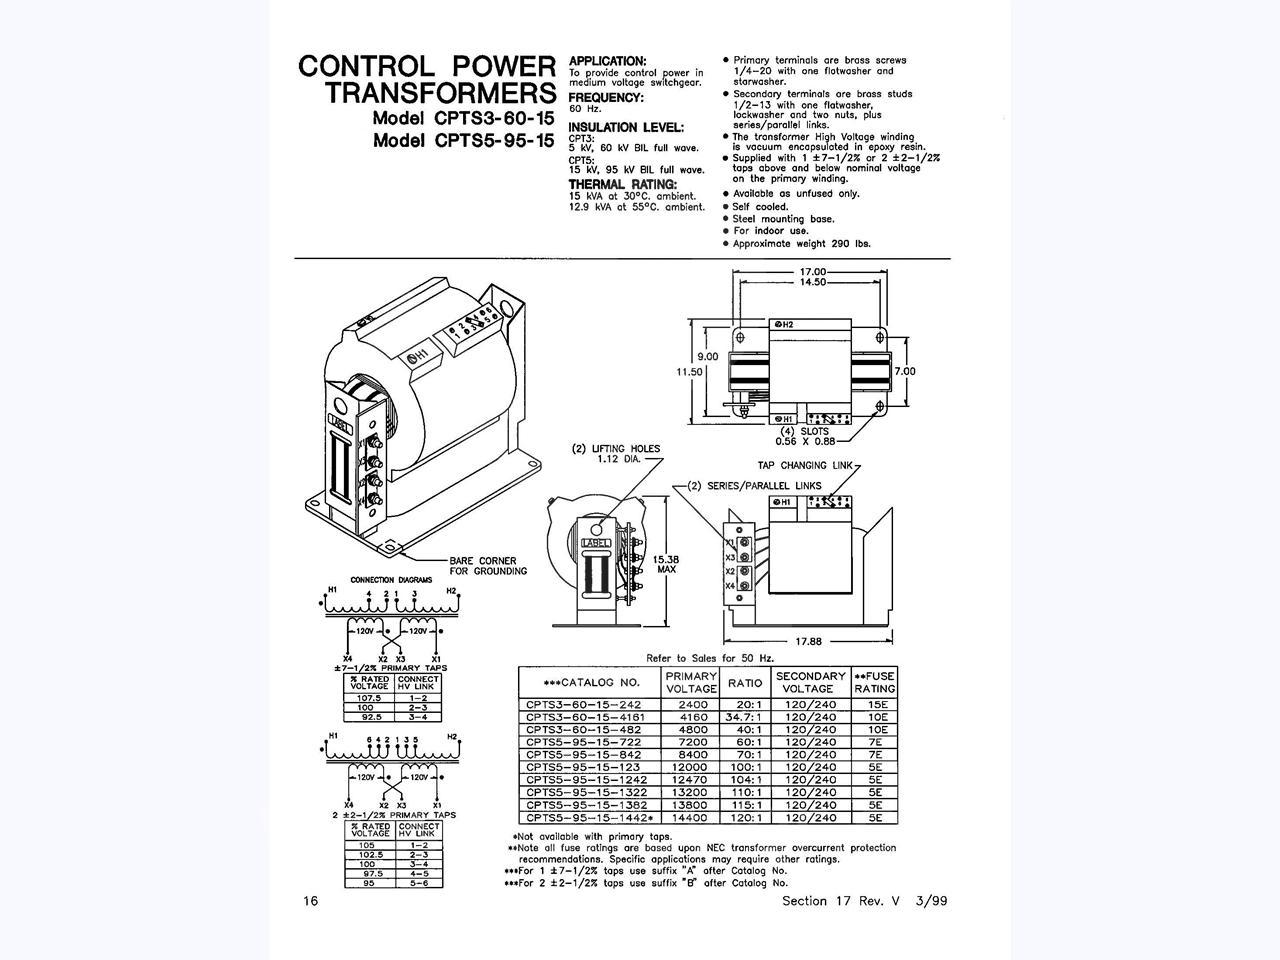 general electric ge 34 7 1 control power transformer  15kva